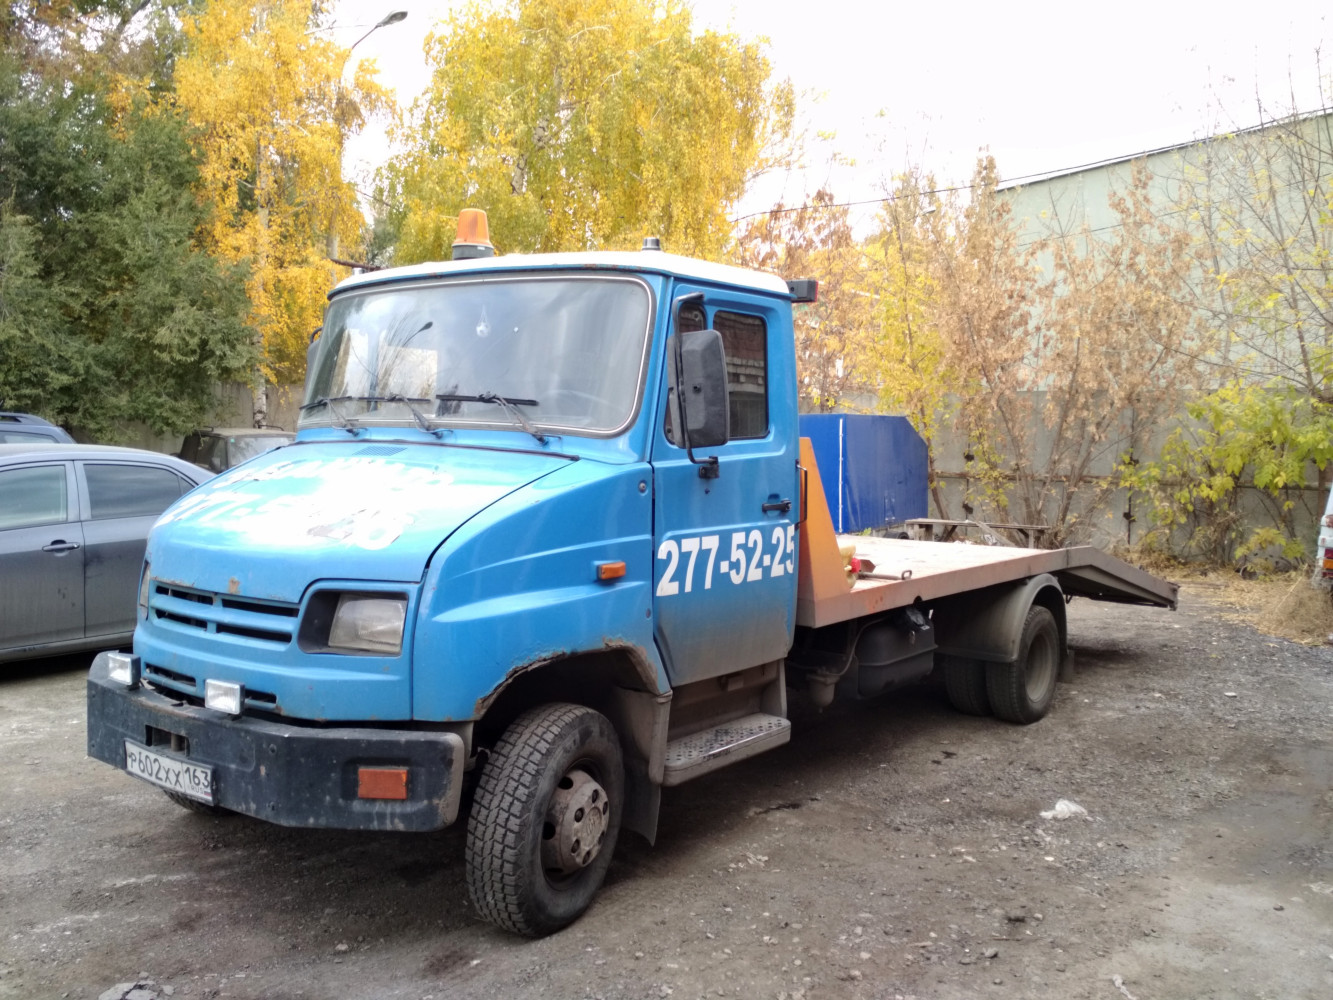 эвакуатор на шасси ЗиЛ-5301* #р 602 хх 163. г. Самара, ул. Красных Коммунаров